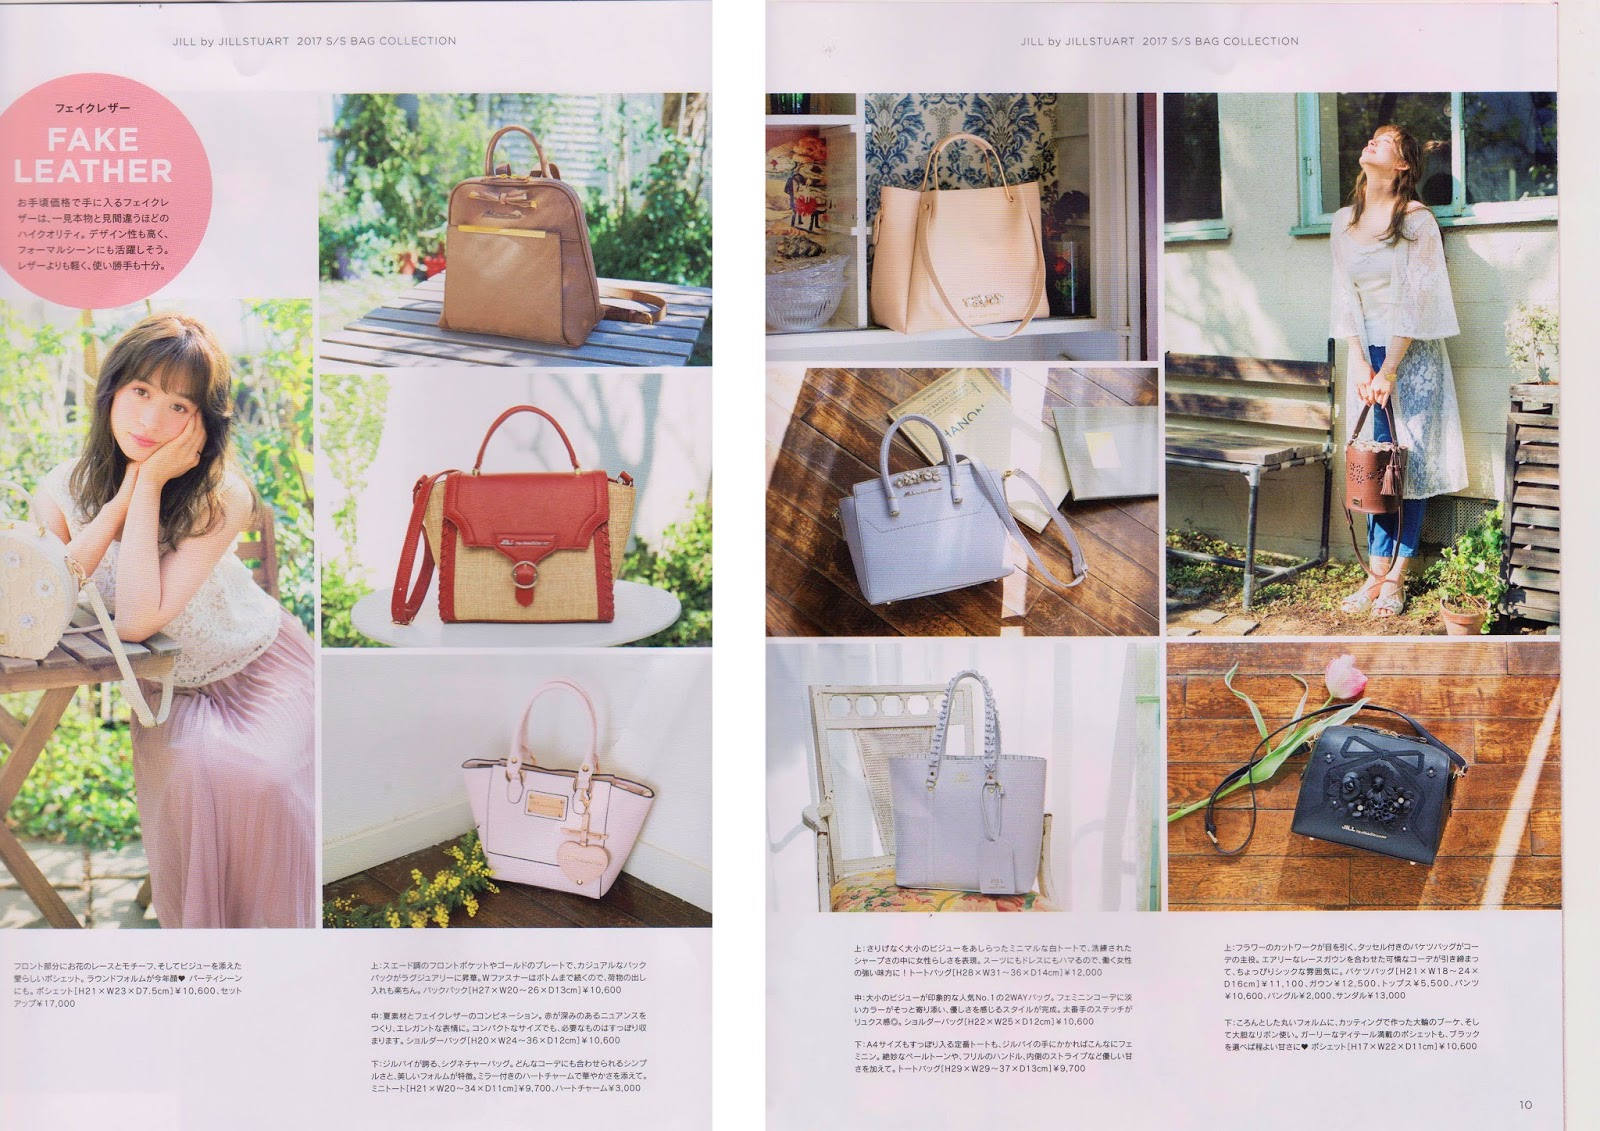 jill stuart japanese handbag collection